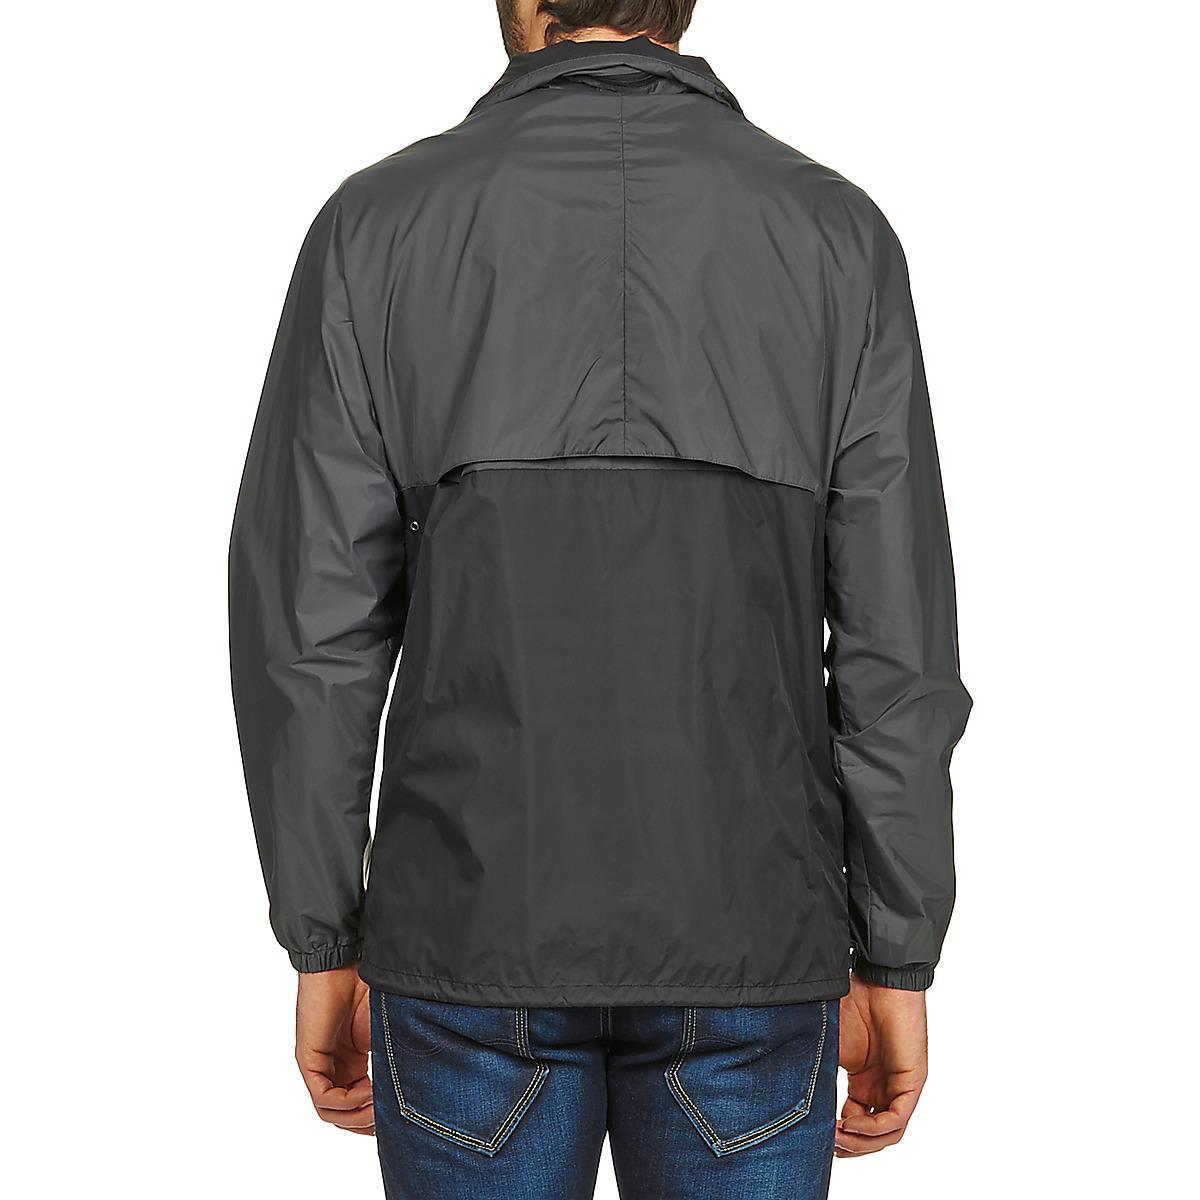 Globe Yarra Men's Jacket In Grey in Grey for Men